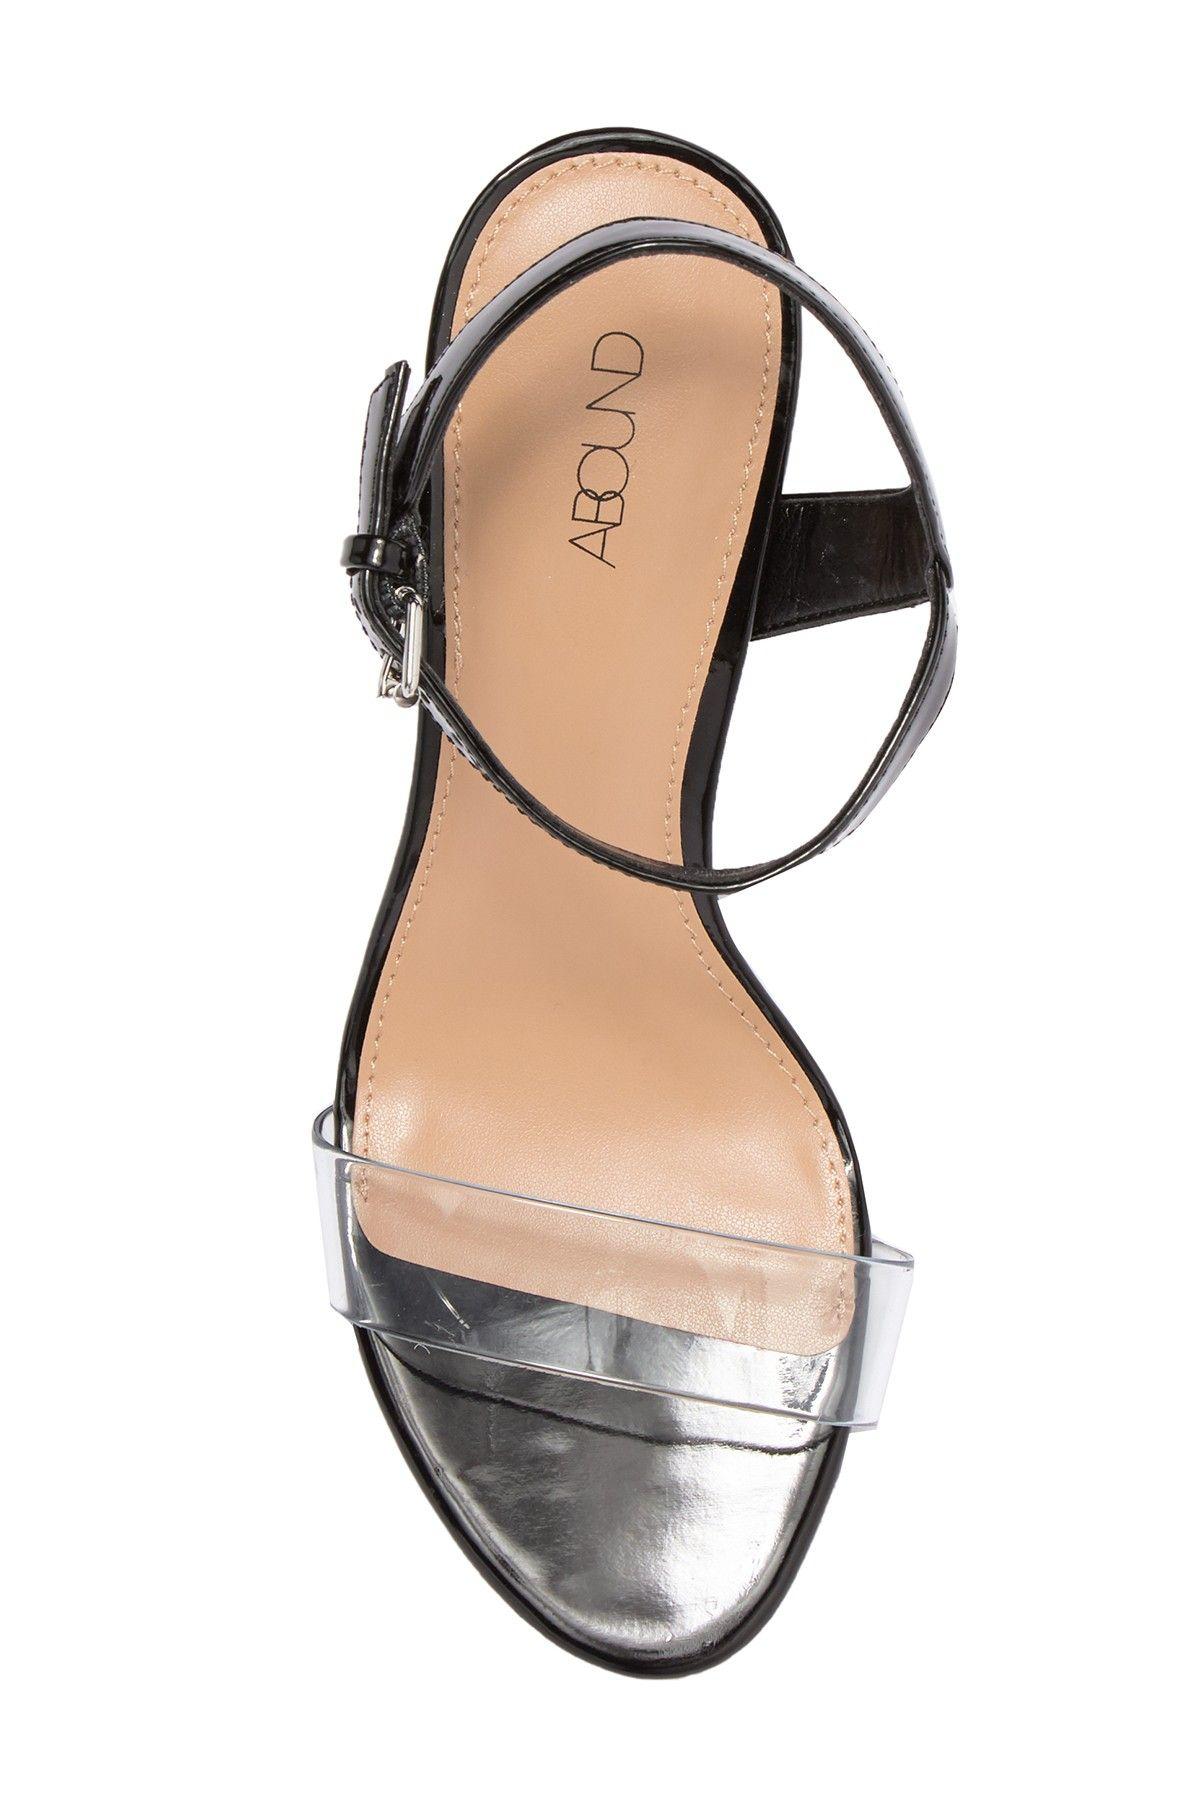 Abound | Steph Block Heel Sandal